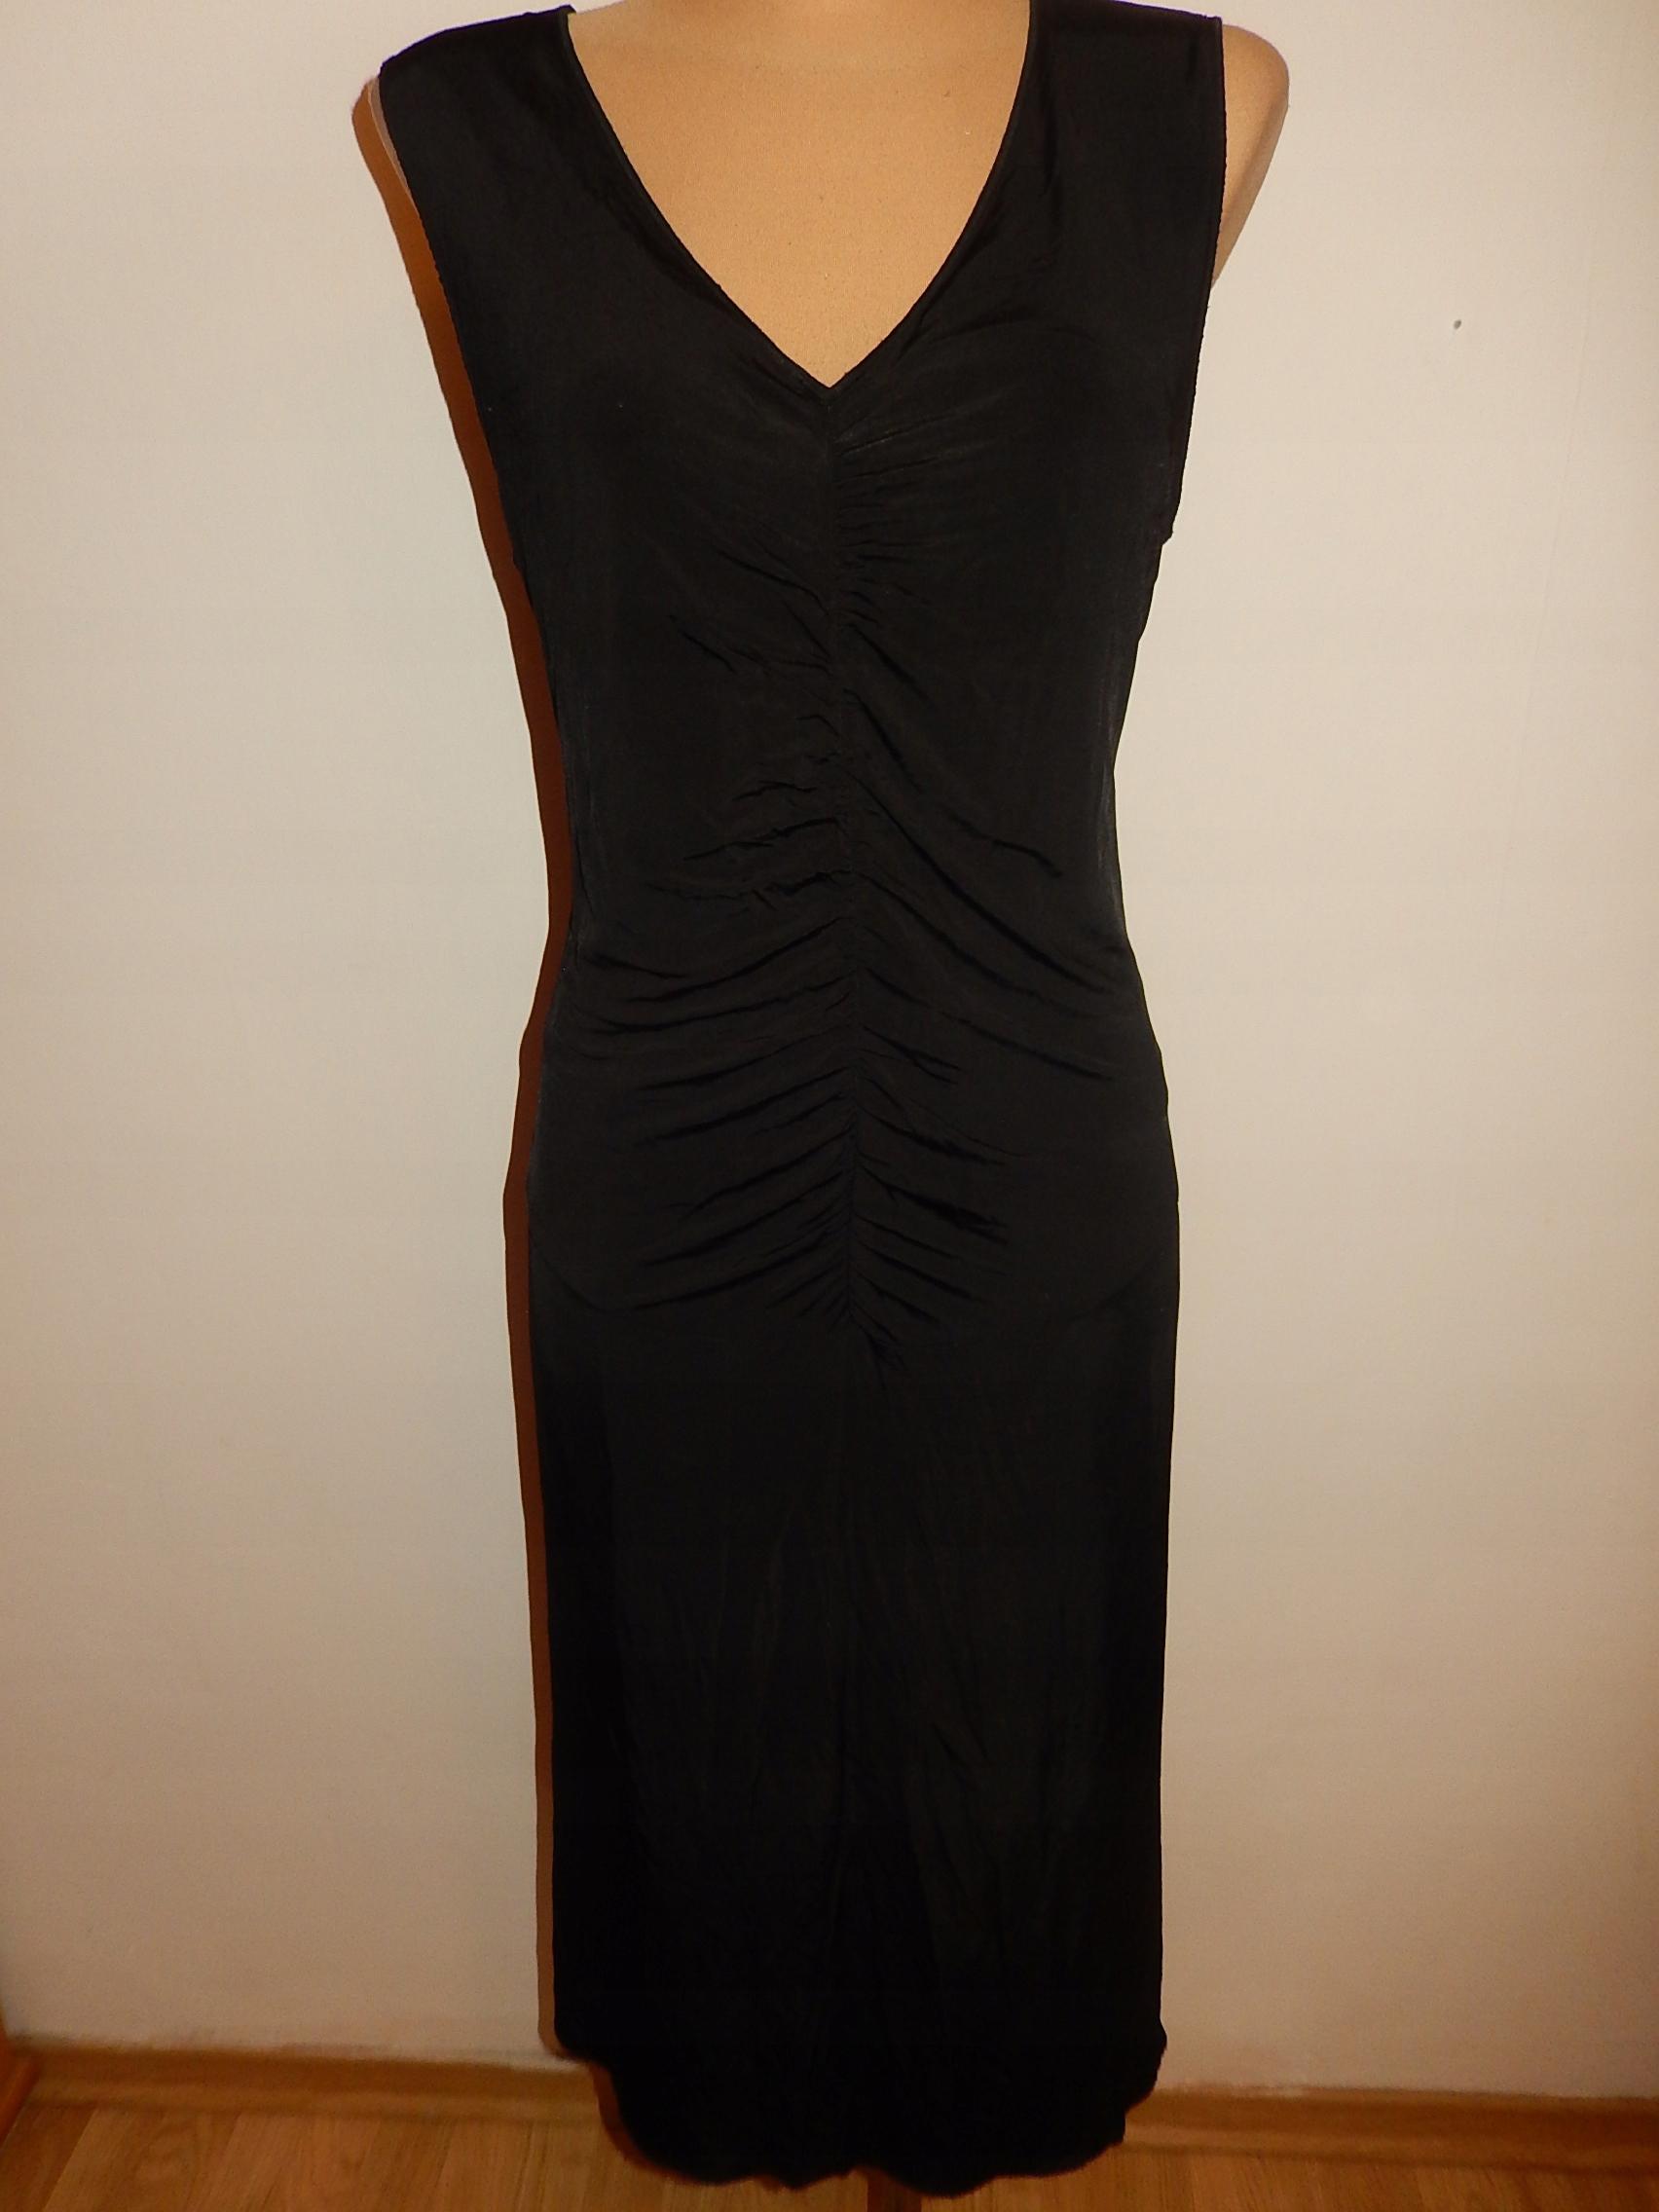 60918174d7 H M czarna sukienka r.42 44~falek18 - 7450266758 - oficjalne ...